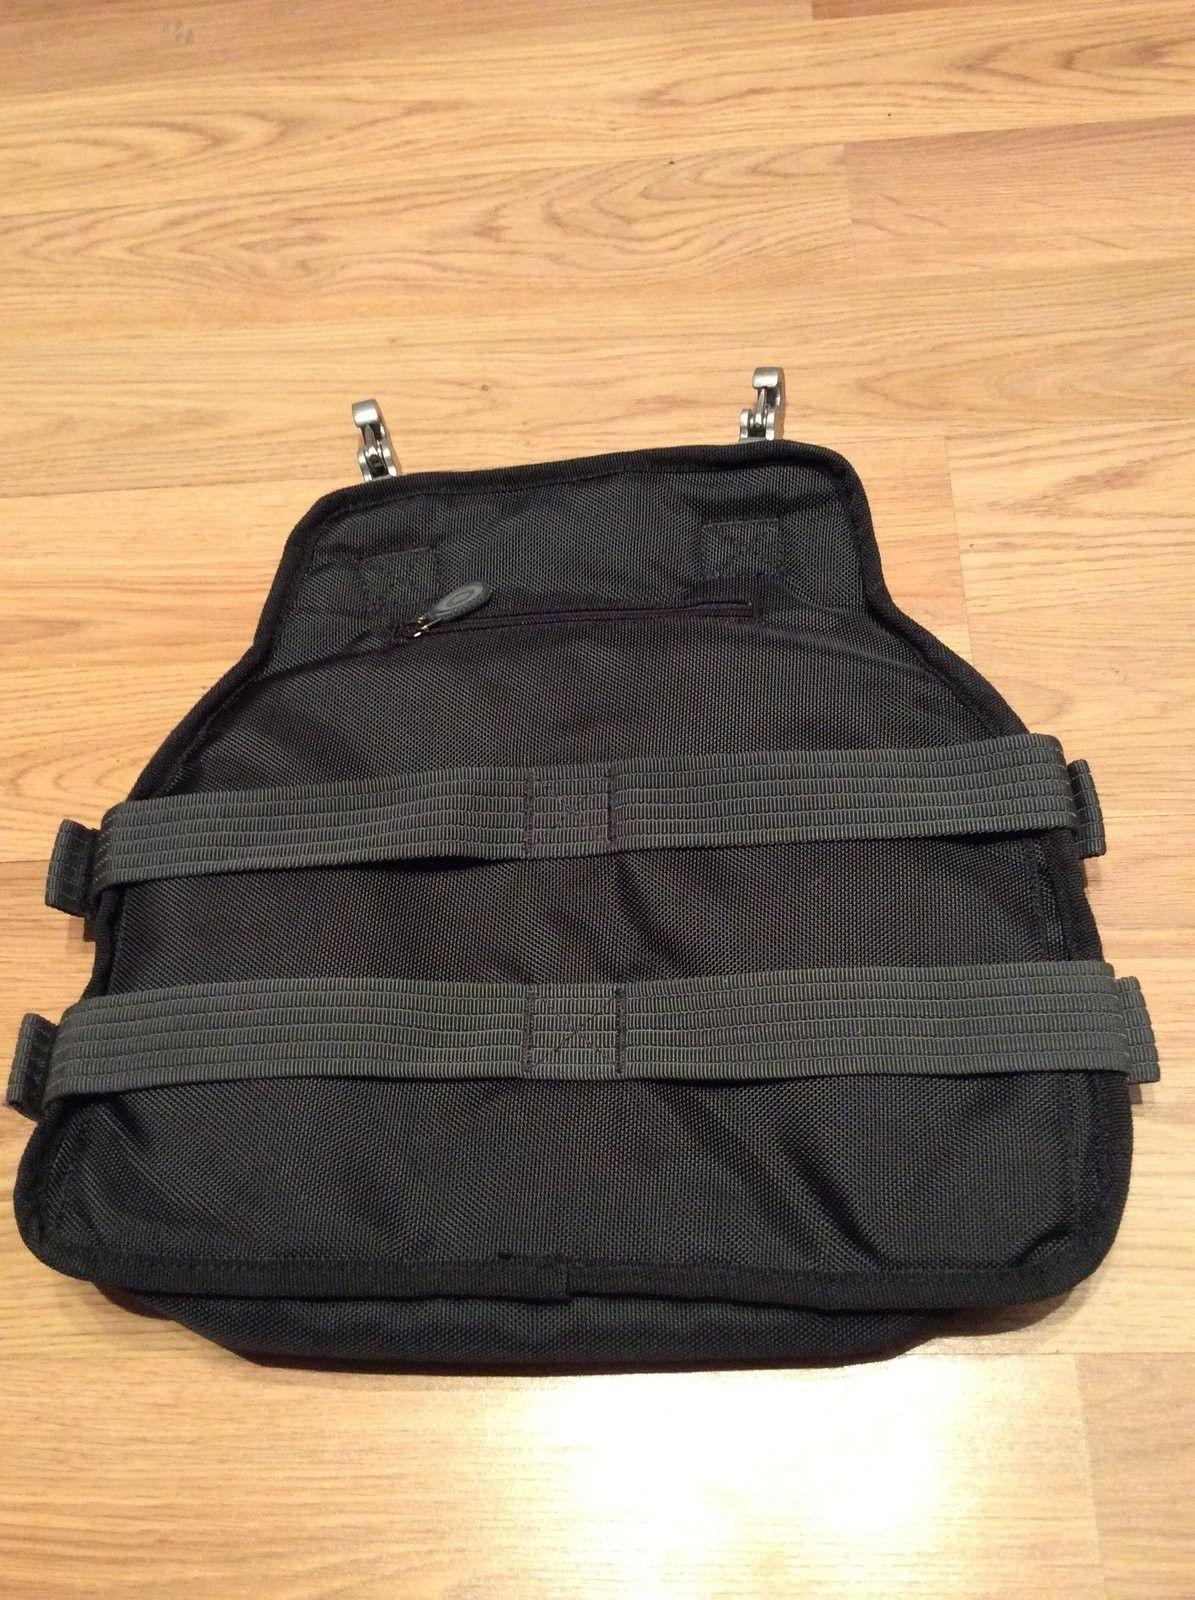 Rare AP luggage Attachment $80 shipped - image.jpg